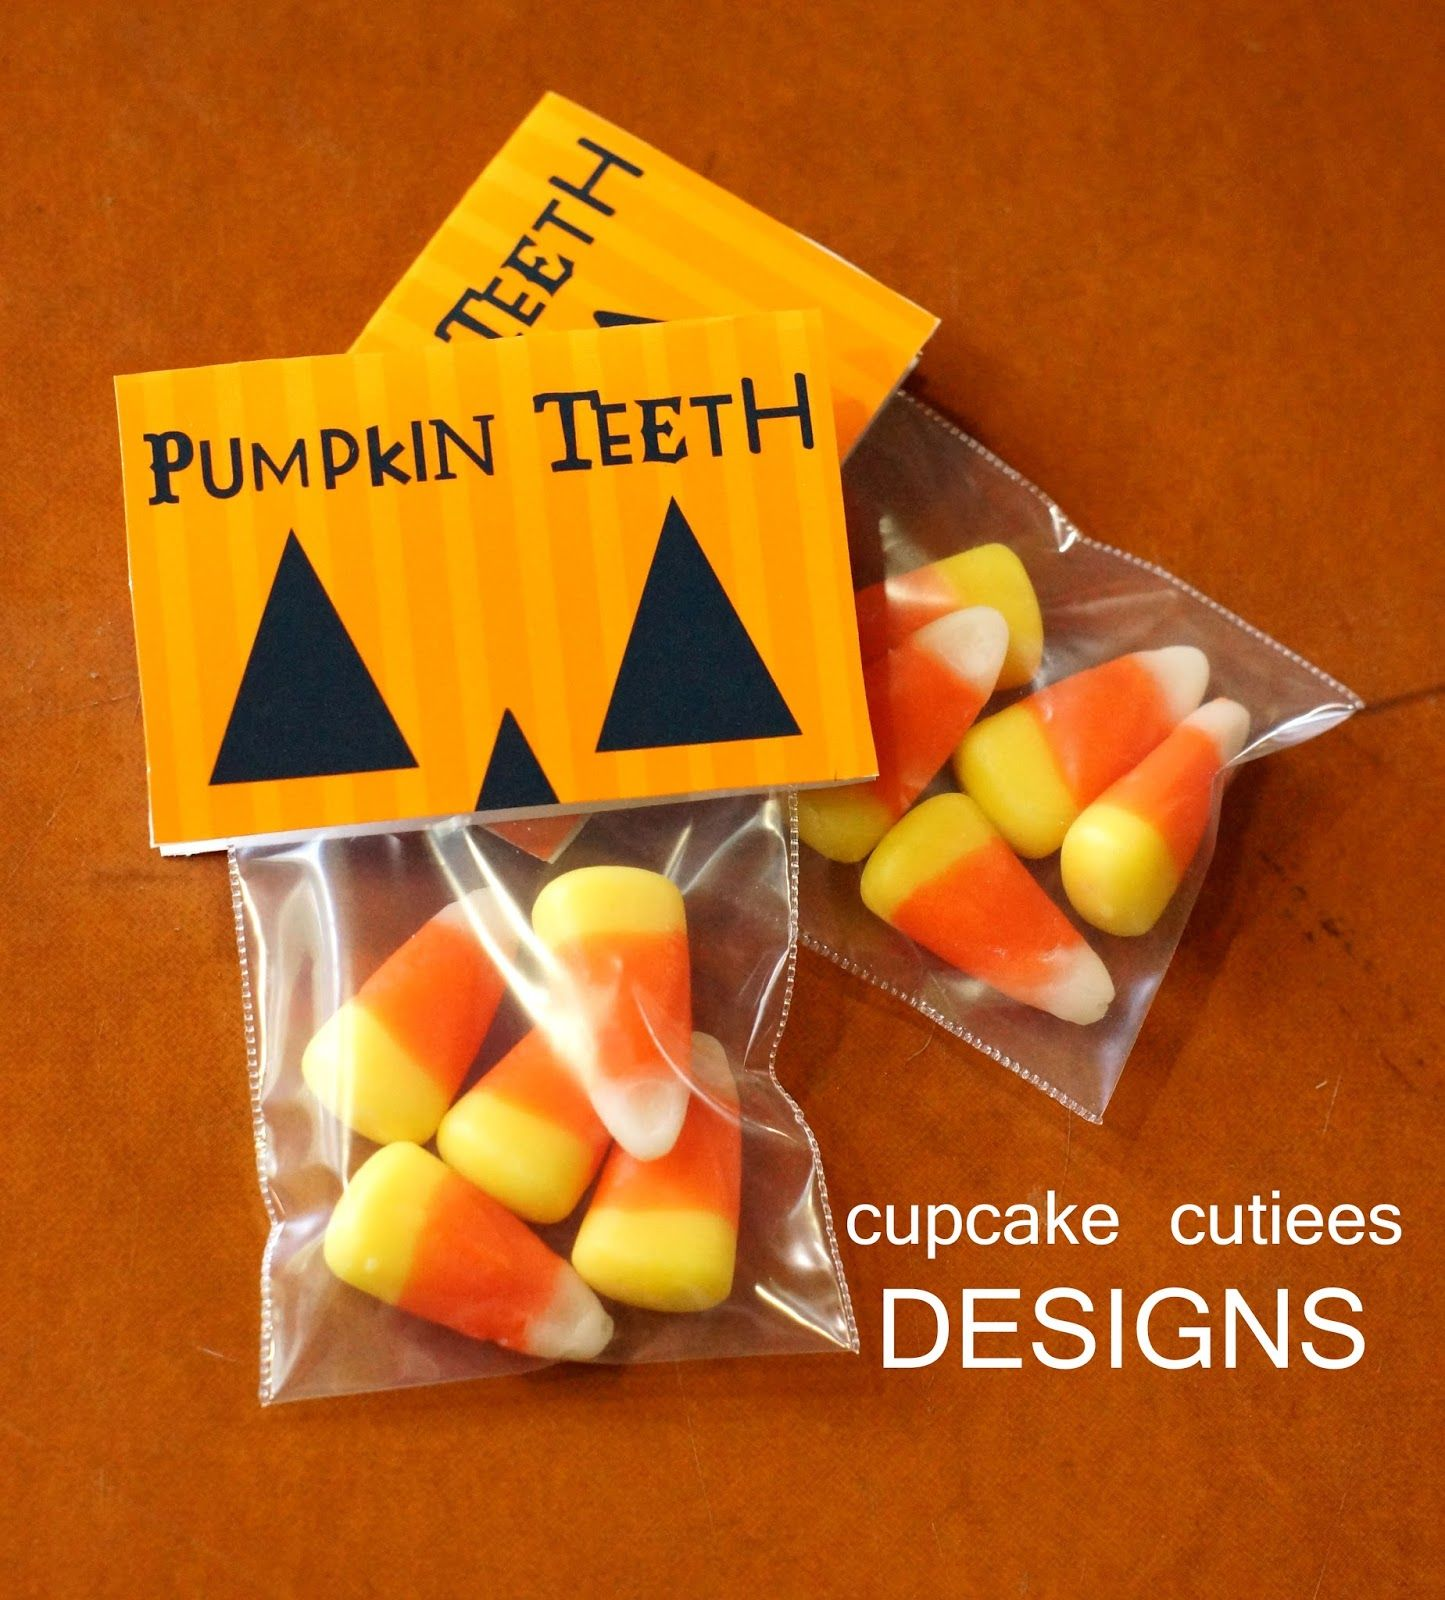 cupcake cutiees pumpkin teeth halloween fun party craft digital diy party store - Halloween Party Store